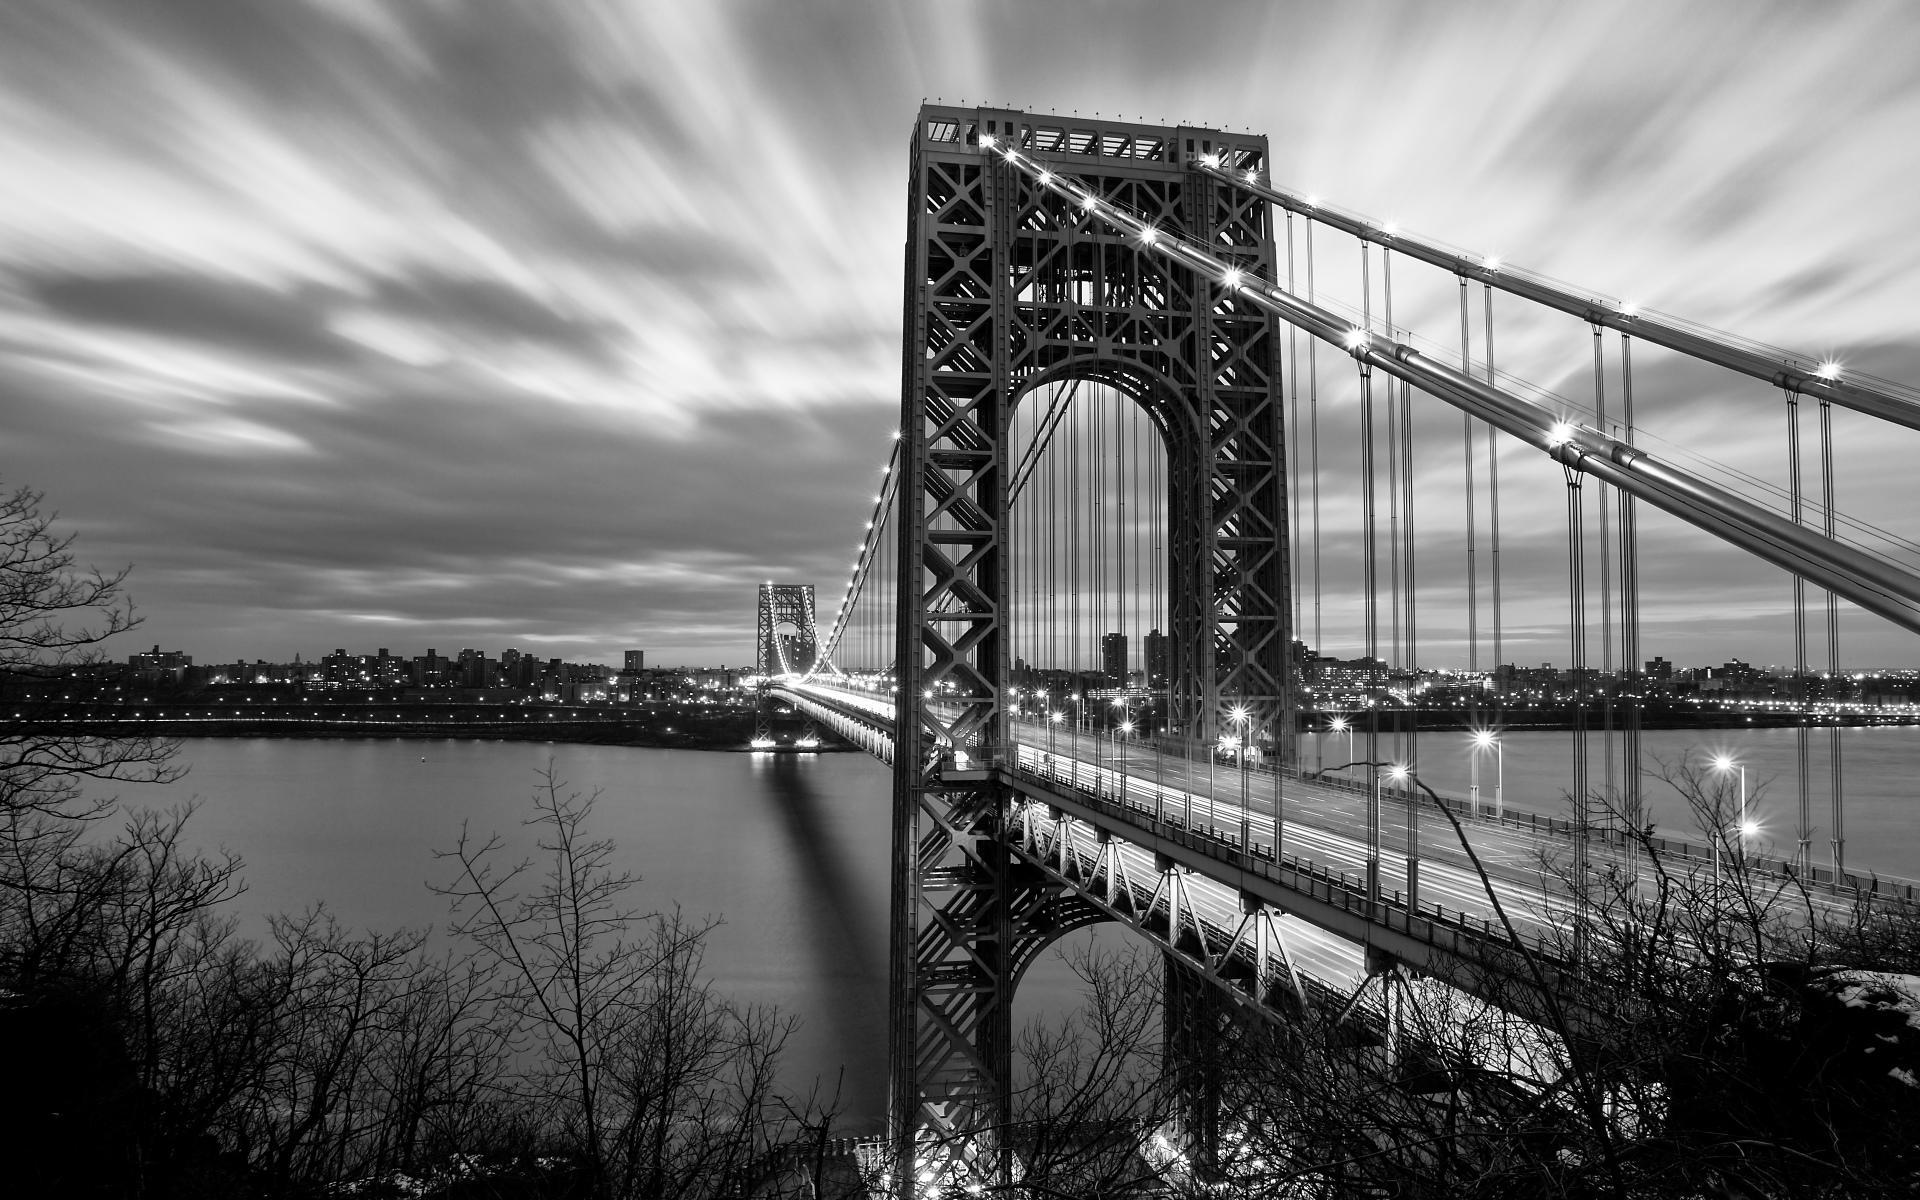 George Washington Bridge wallpapers HD quality